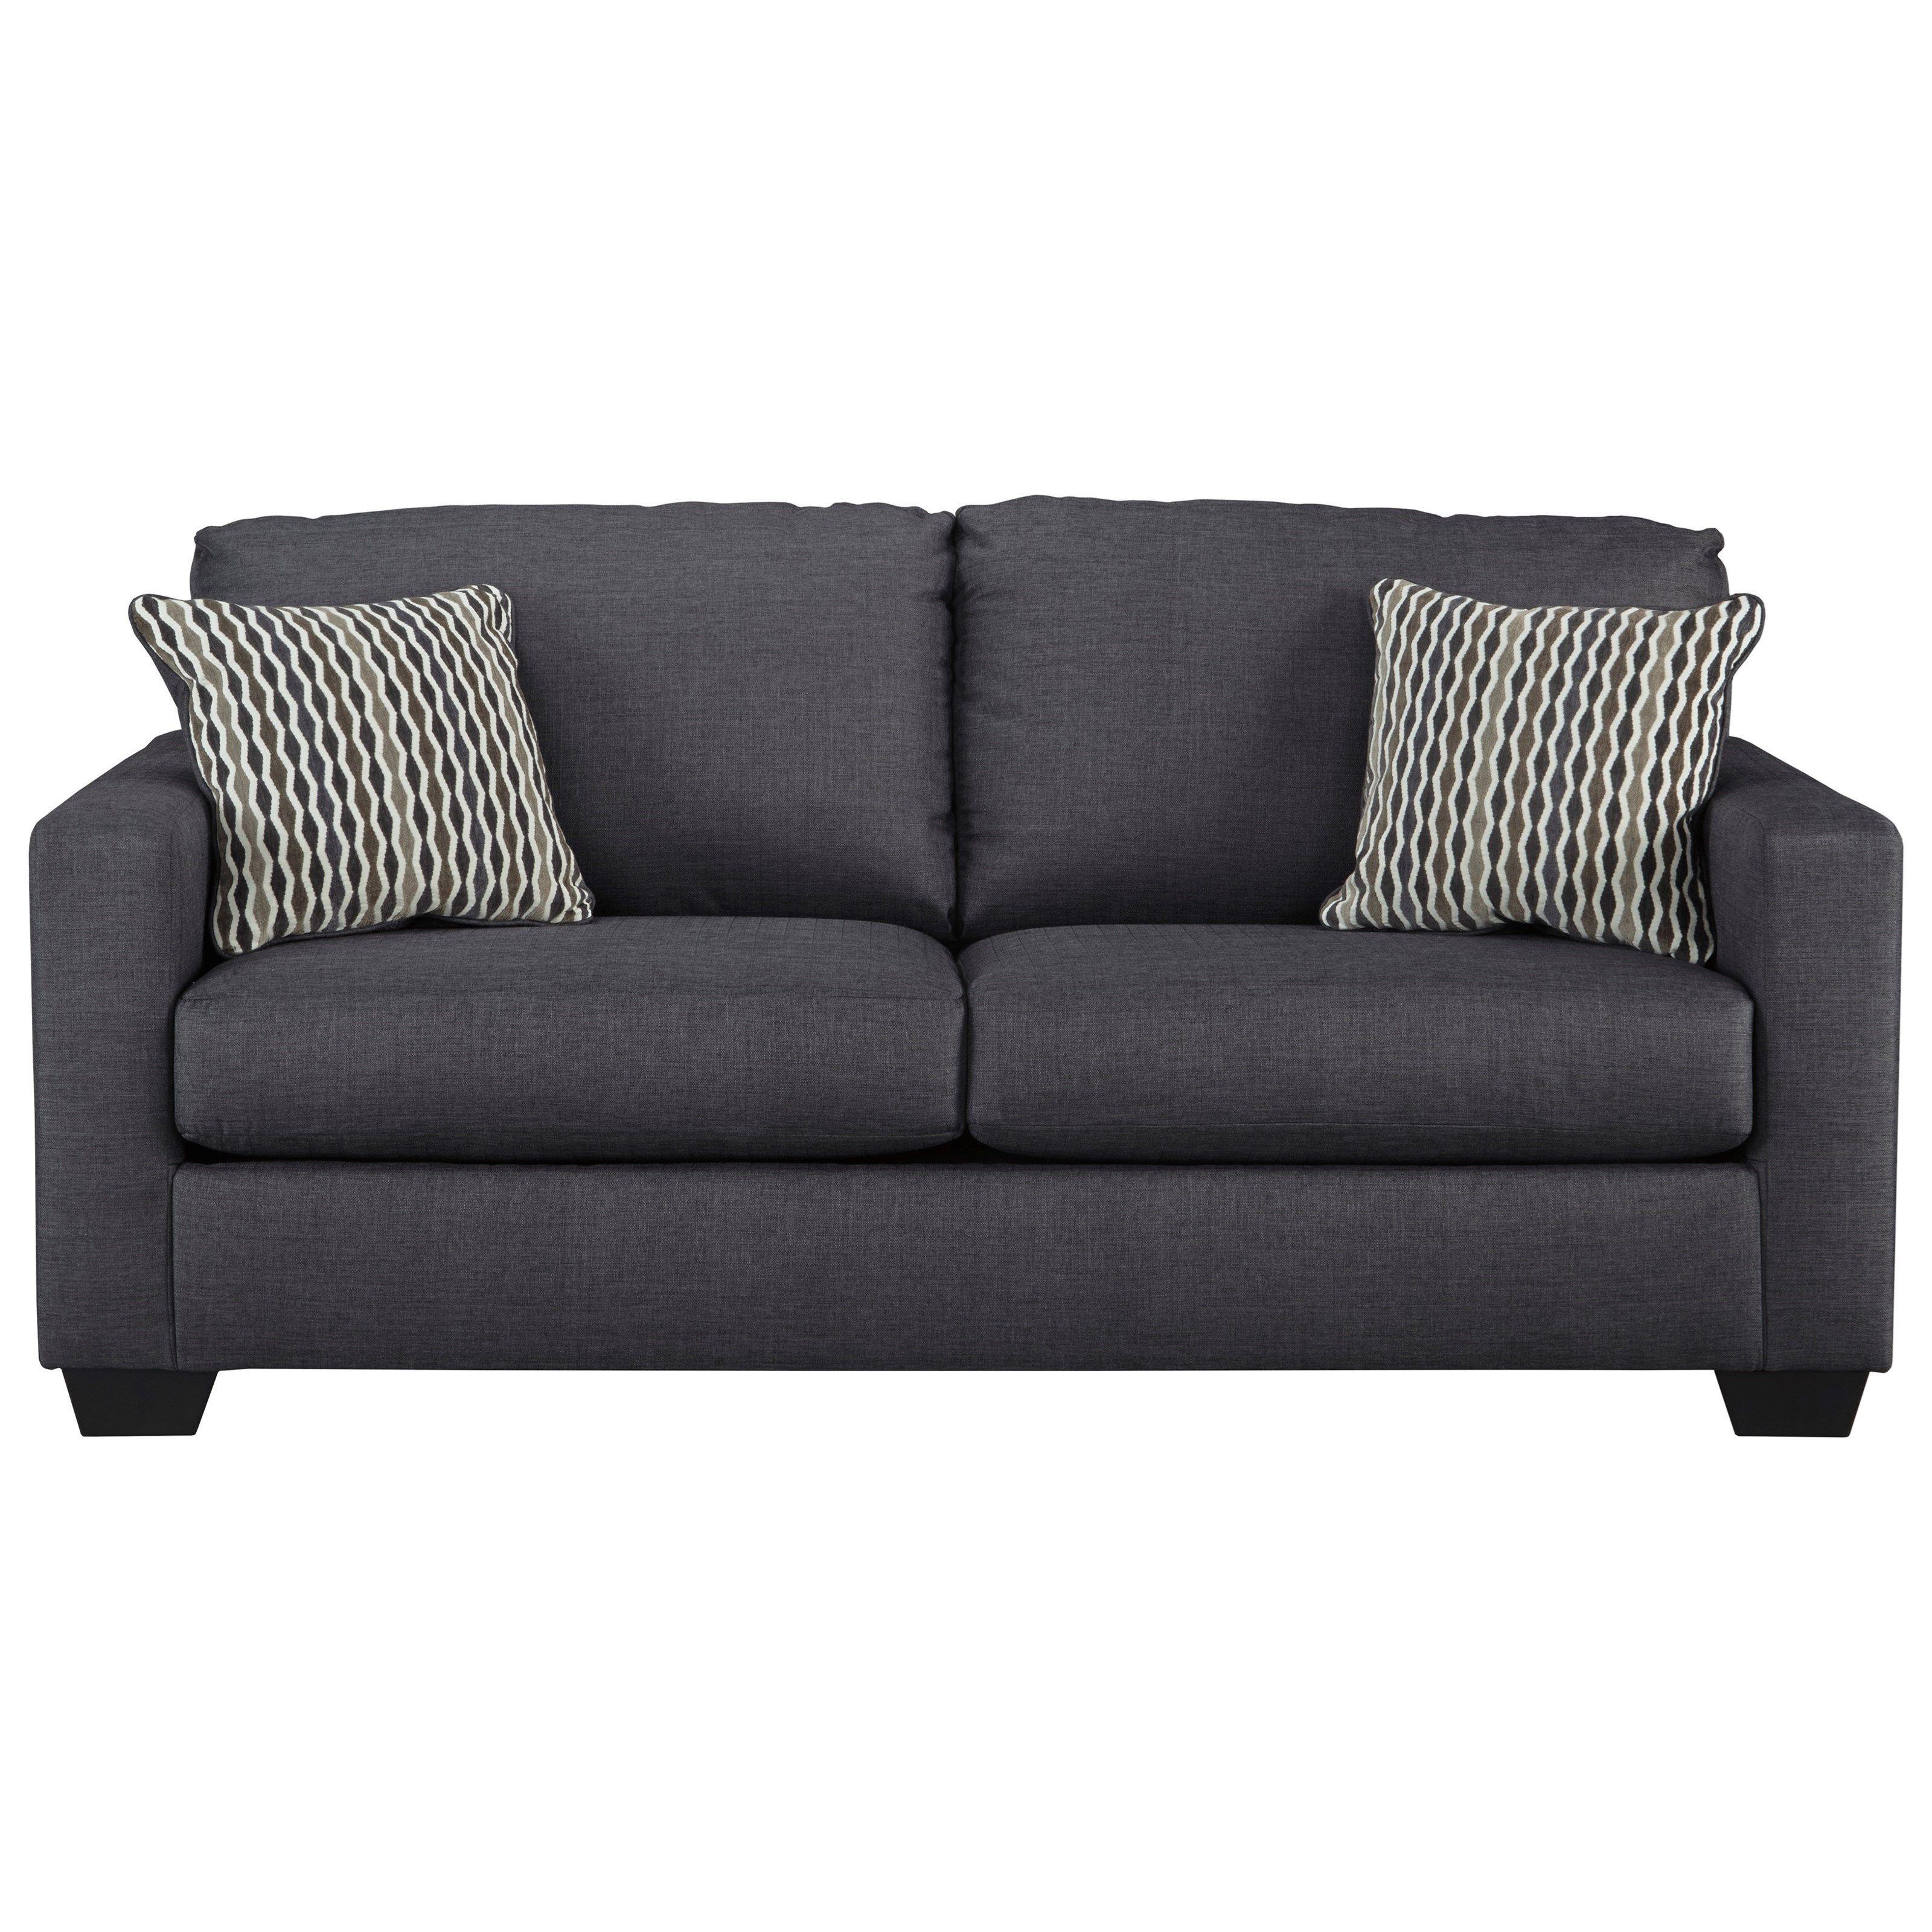 Bavello Sofa At Belfort Furniture Sofa Furniture Sleeper Sofa